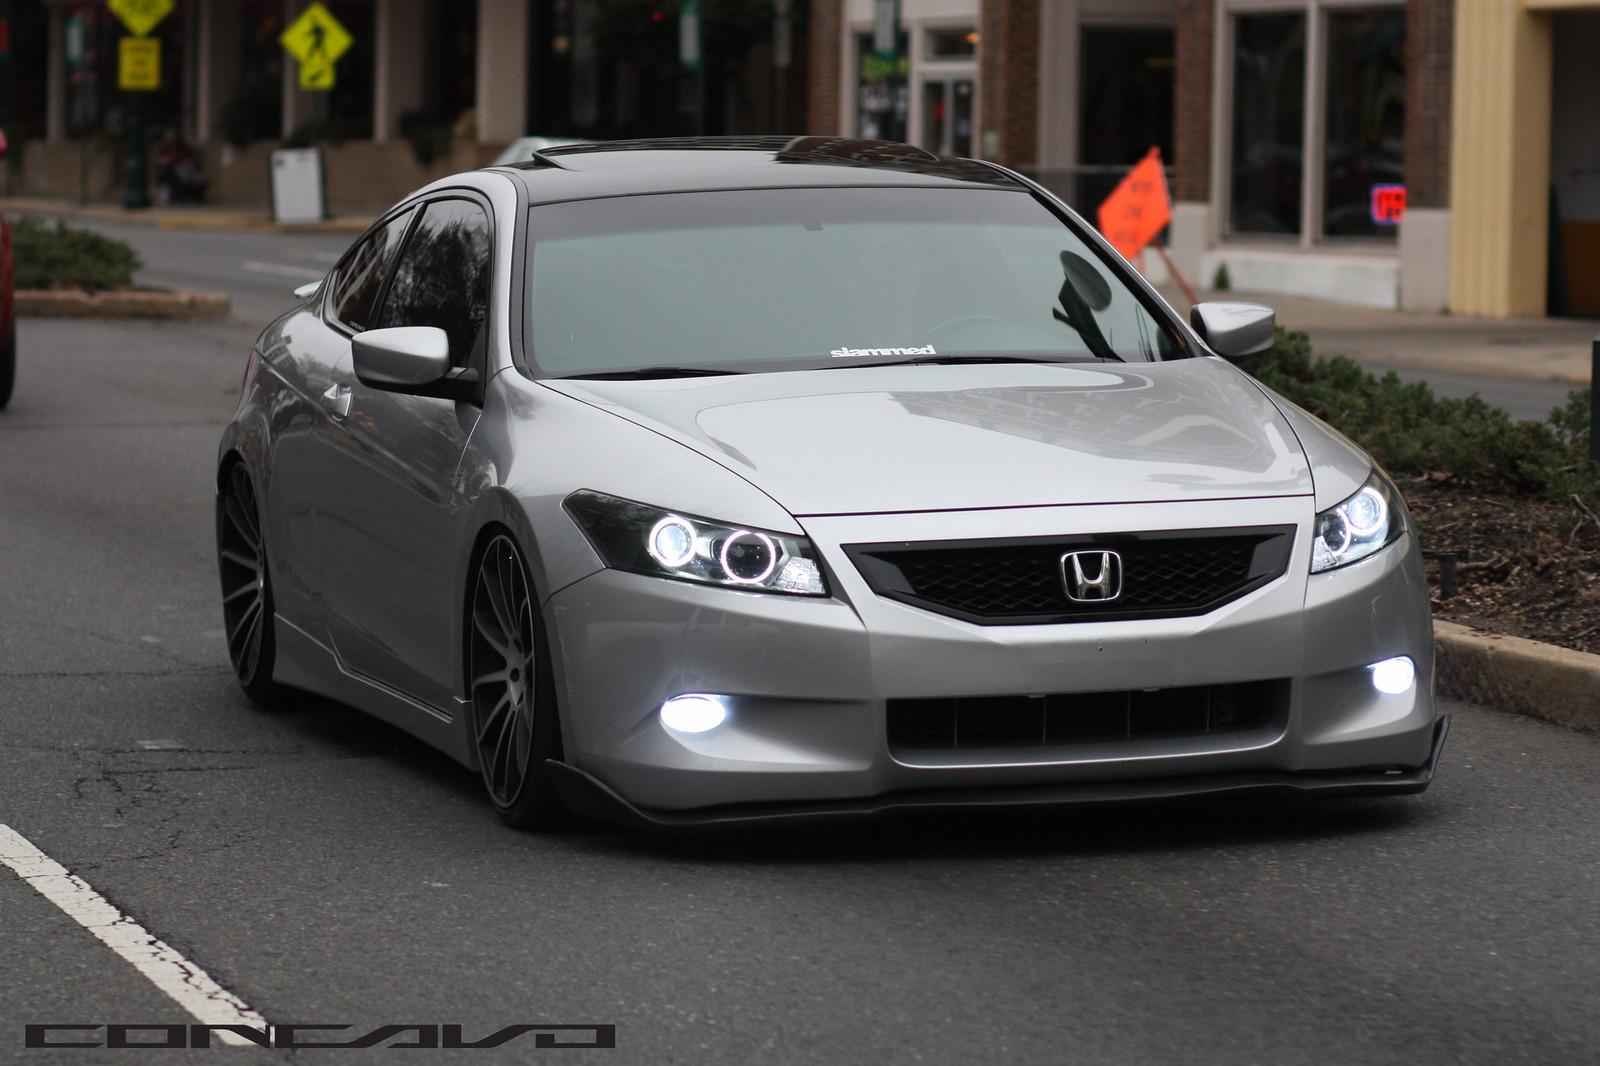 2014 Honda Accord Lx >> Honda Accord Coupe | Concavo CW-12 | Arkansas